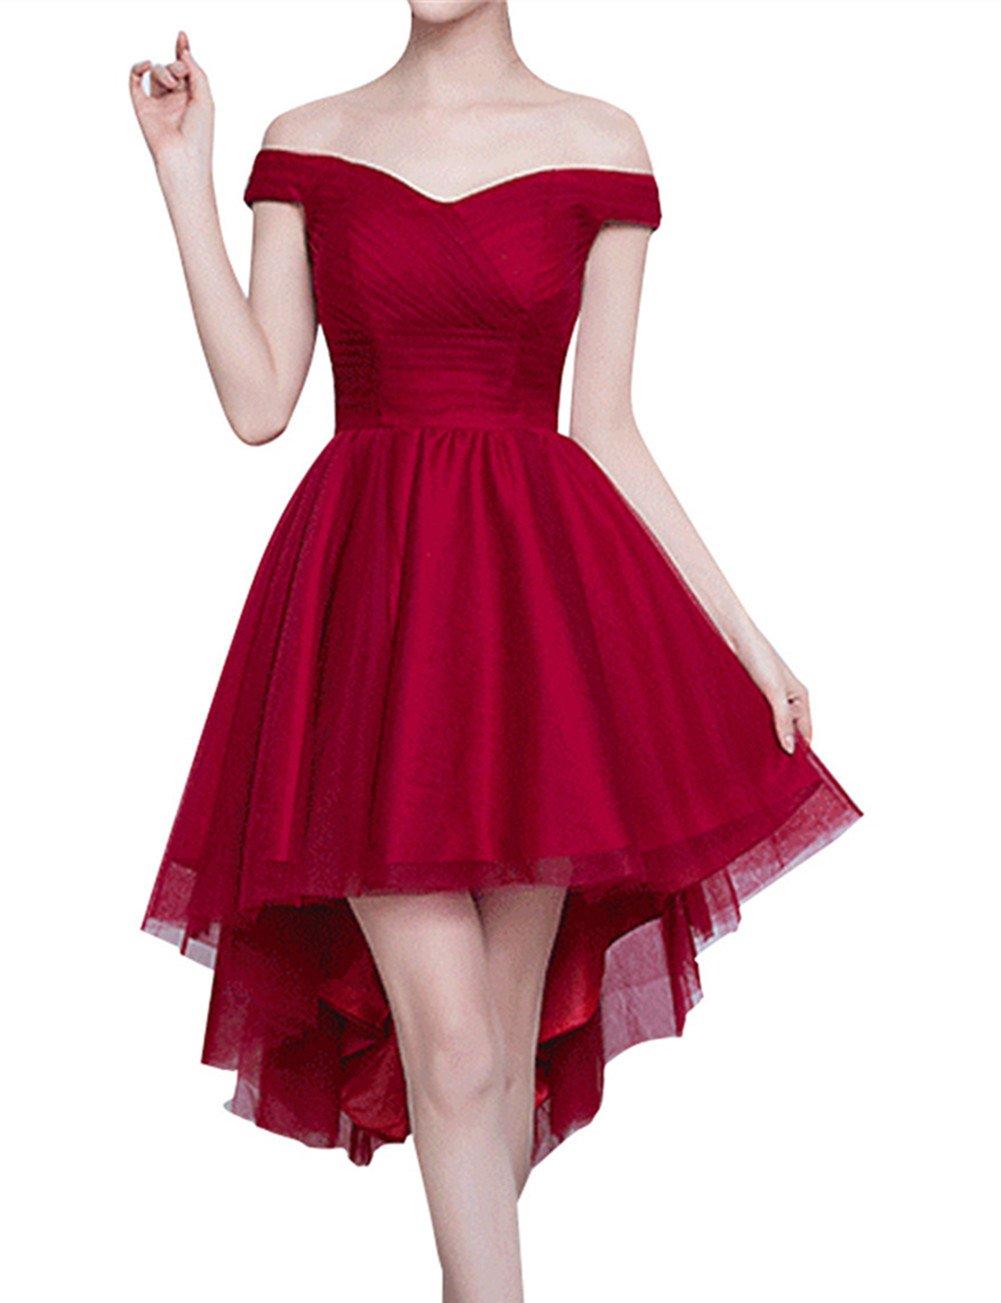 Red Prom Dress: Amazon.com